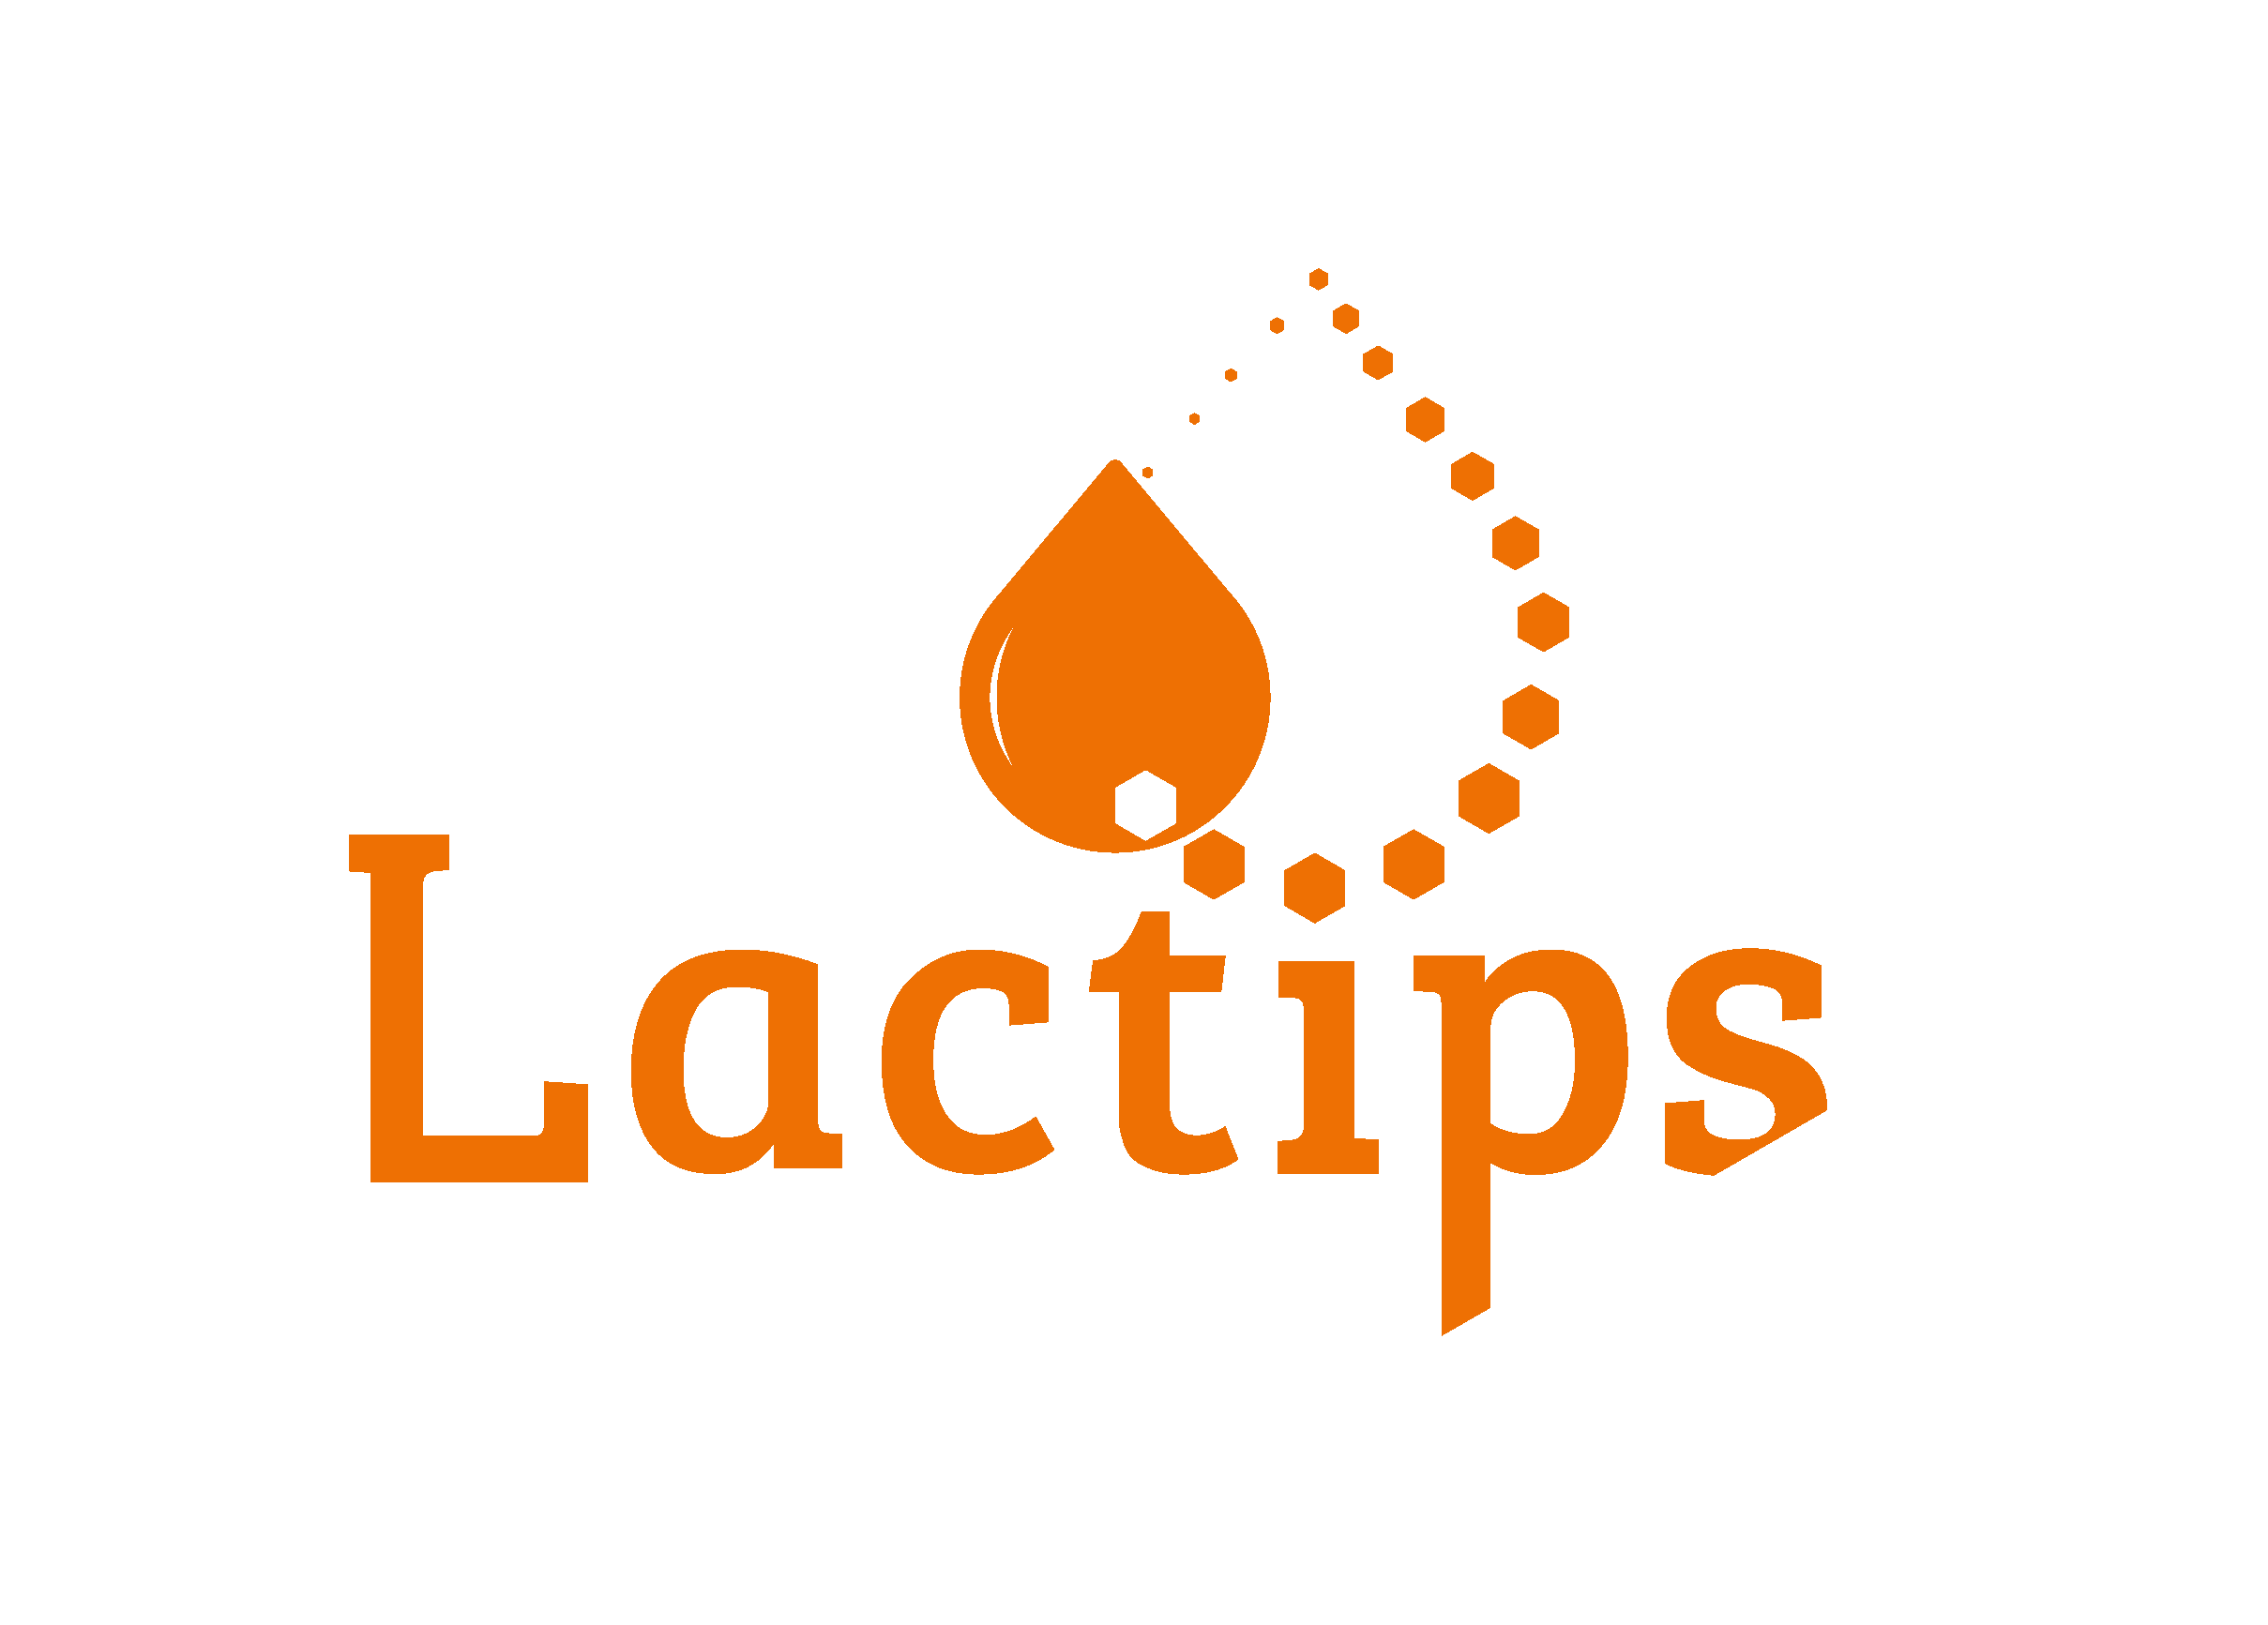 https://europeanplasticspact.org/wp-content/uploads/2021/05/lactips_logotype-lactips-1.png